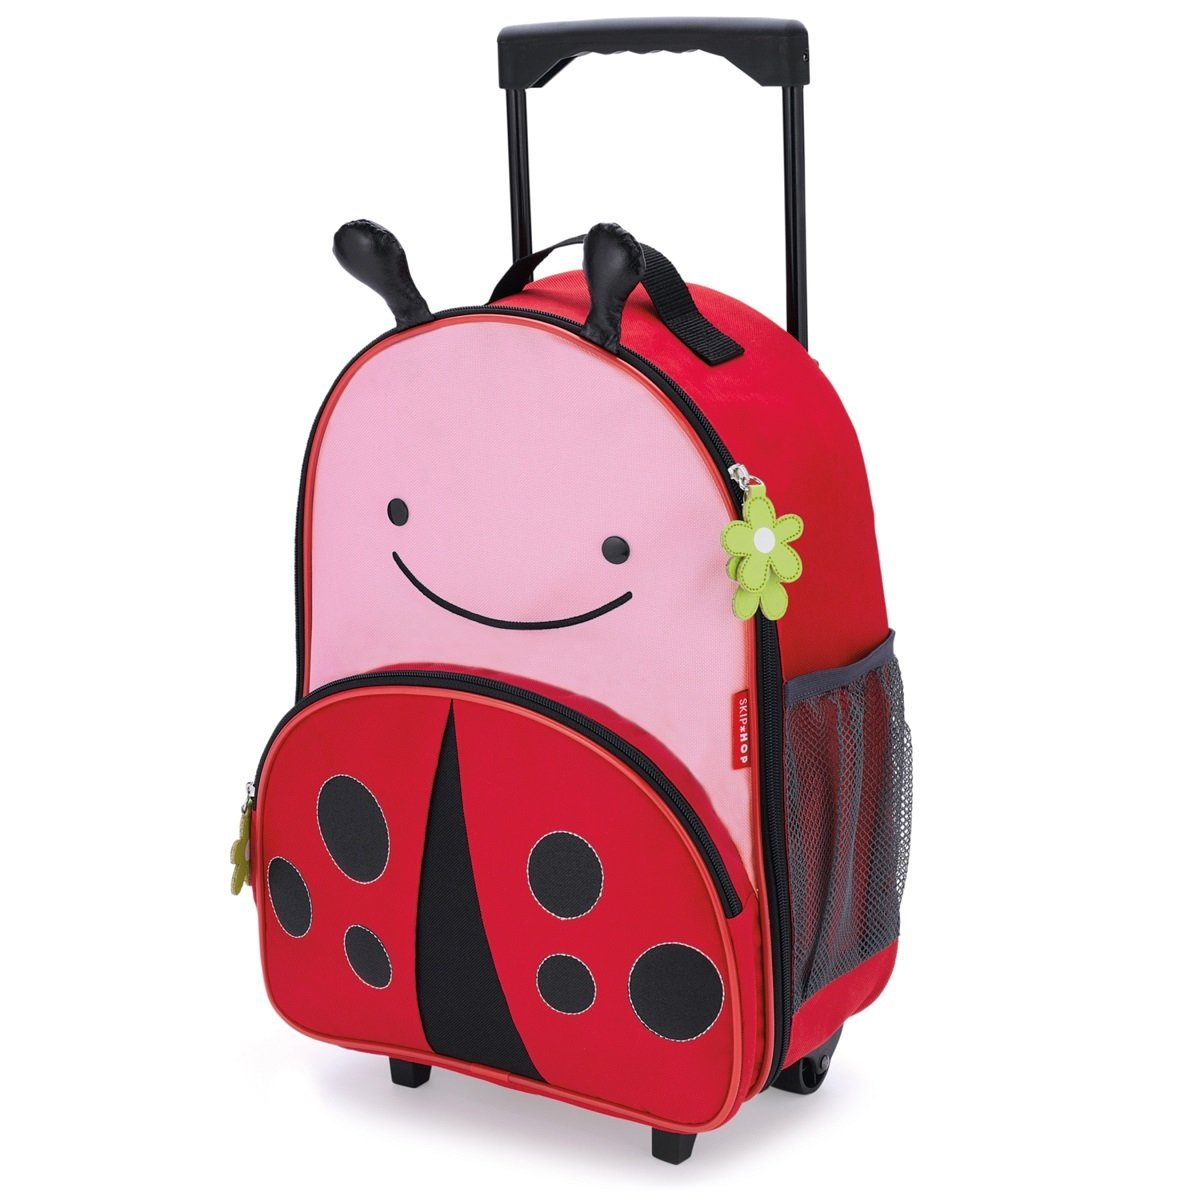 Zoo 可愛動物園小孩專用行李箱 - 甲蟲